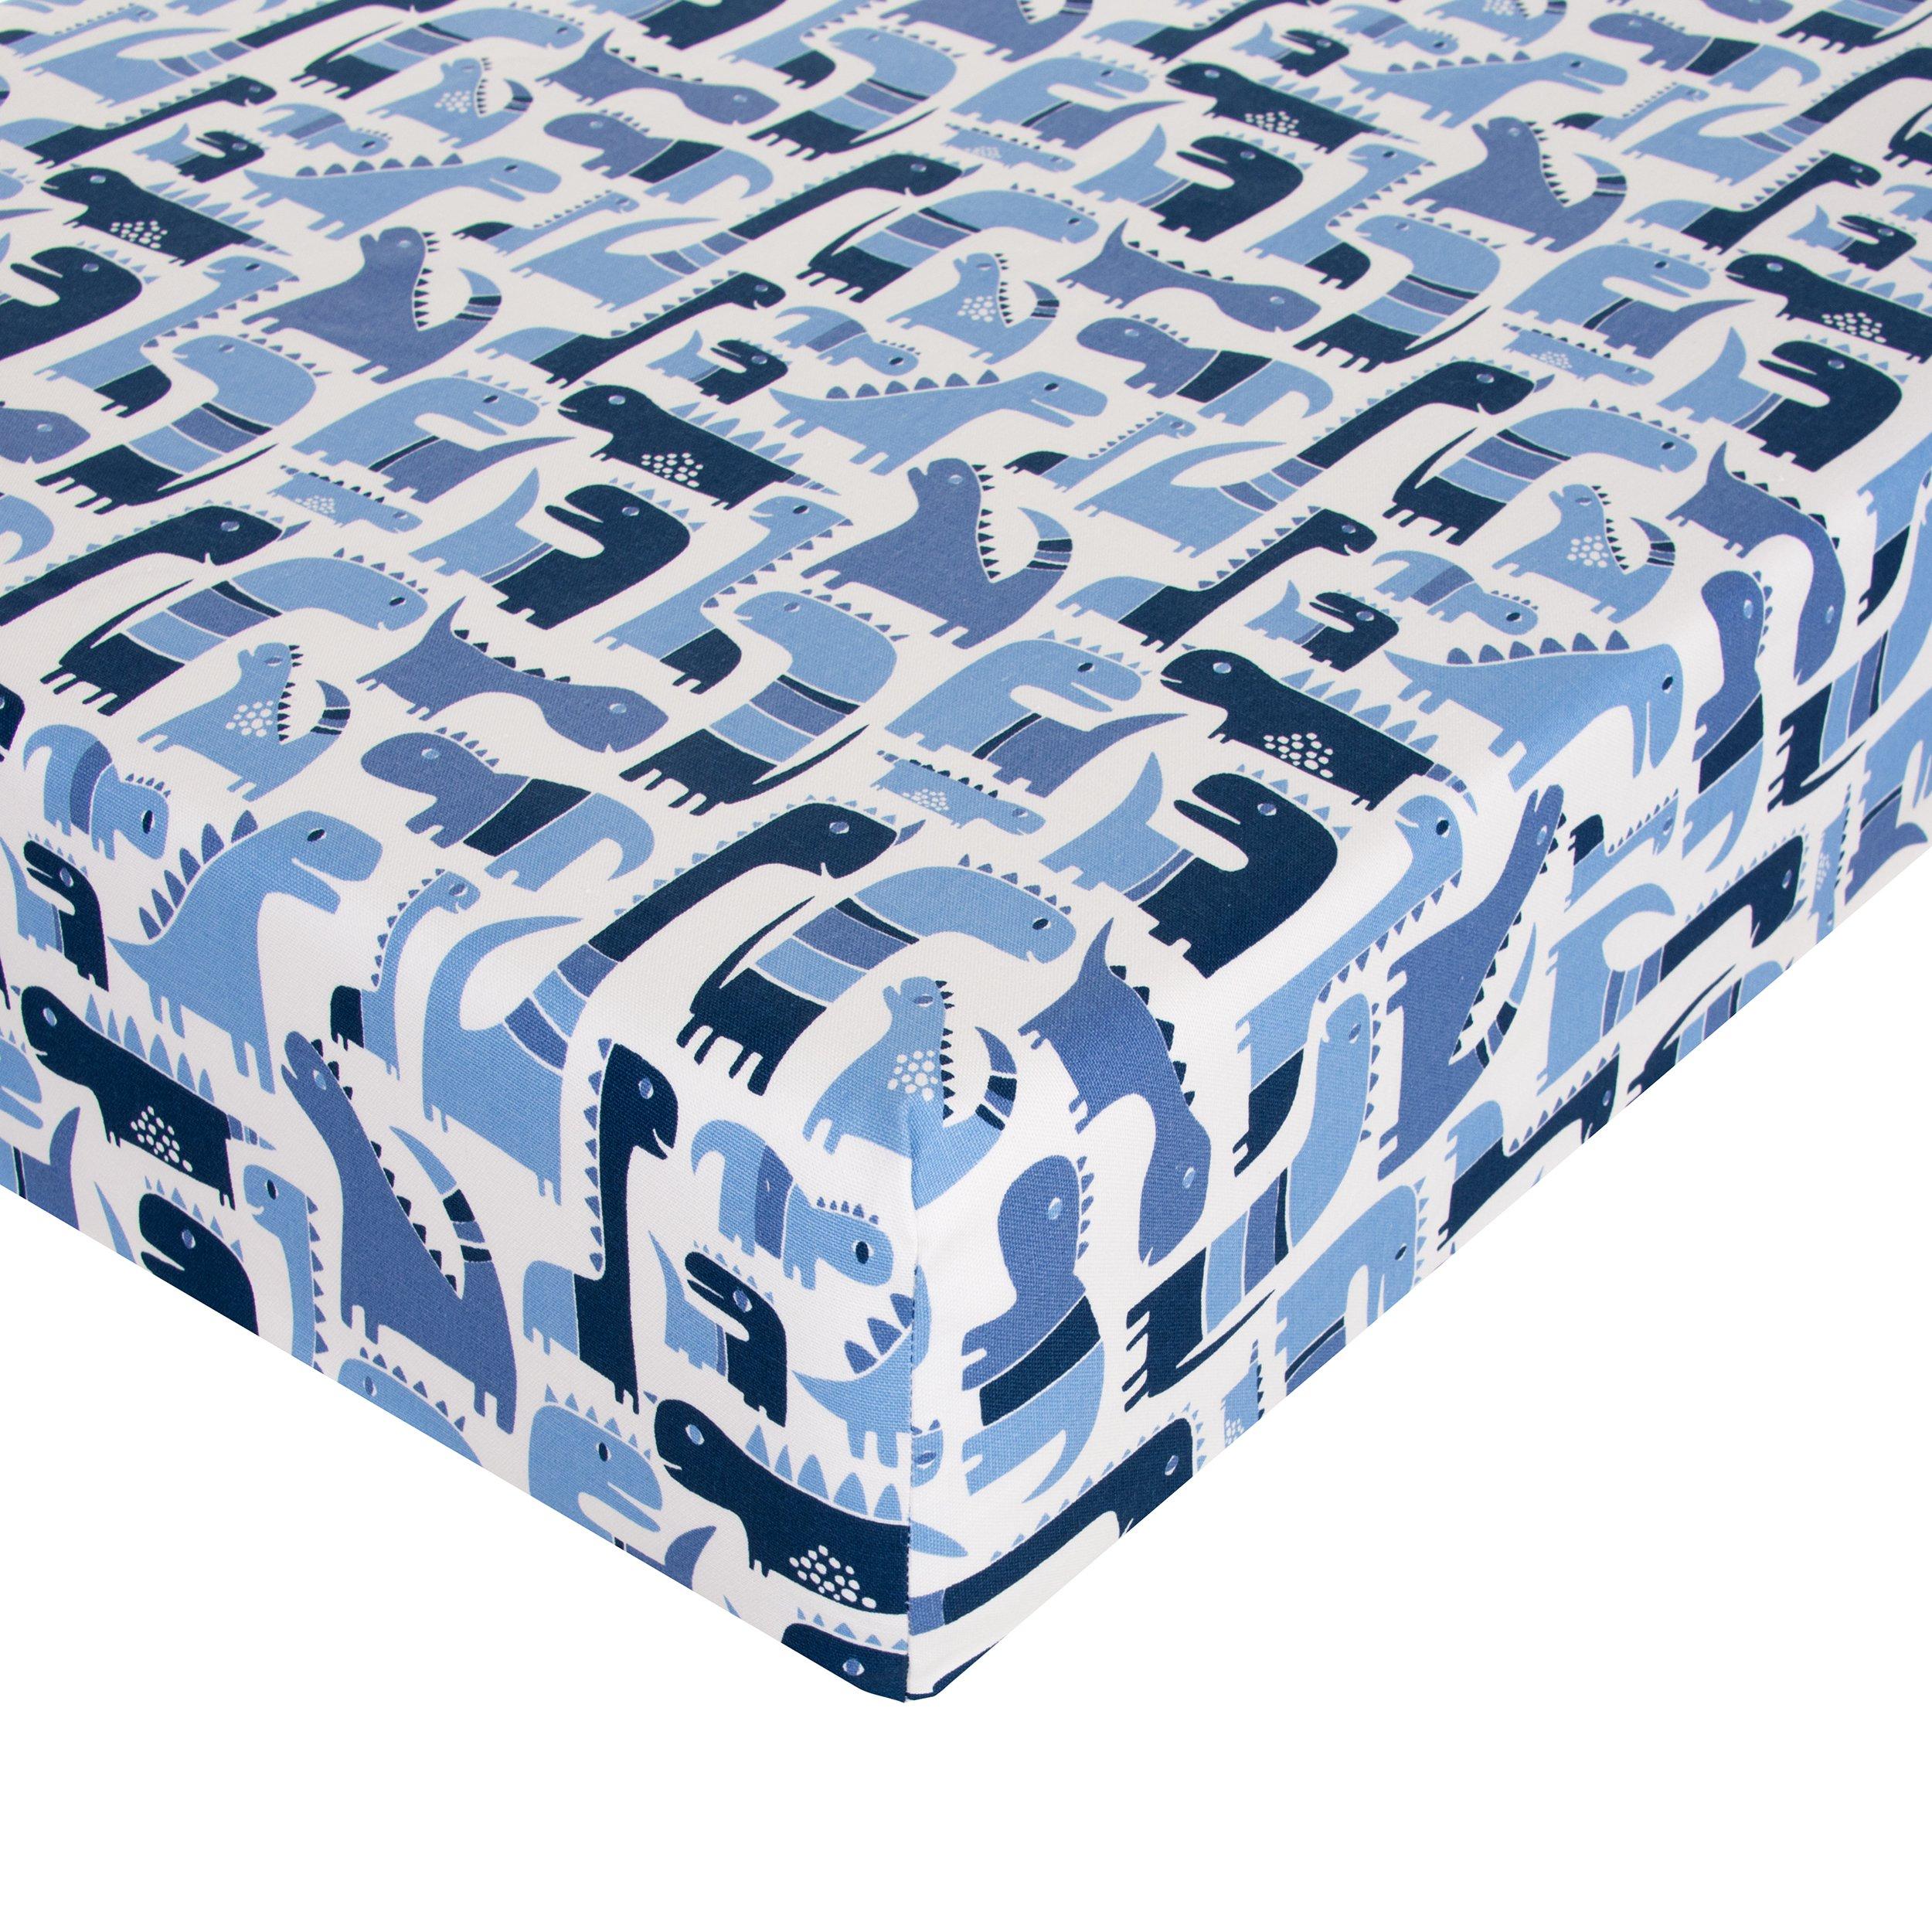 Glenna Jean Dino Blue Crib Sheet Fitted 28''x52''x8'' Nursery Standard